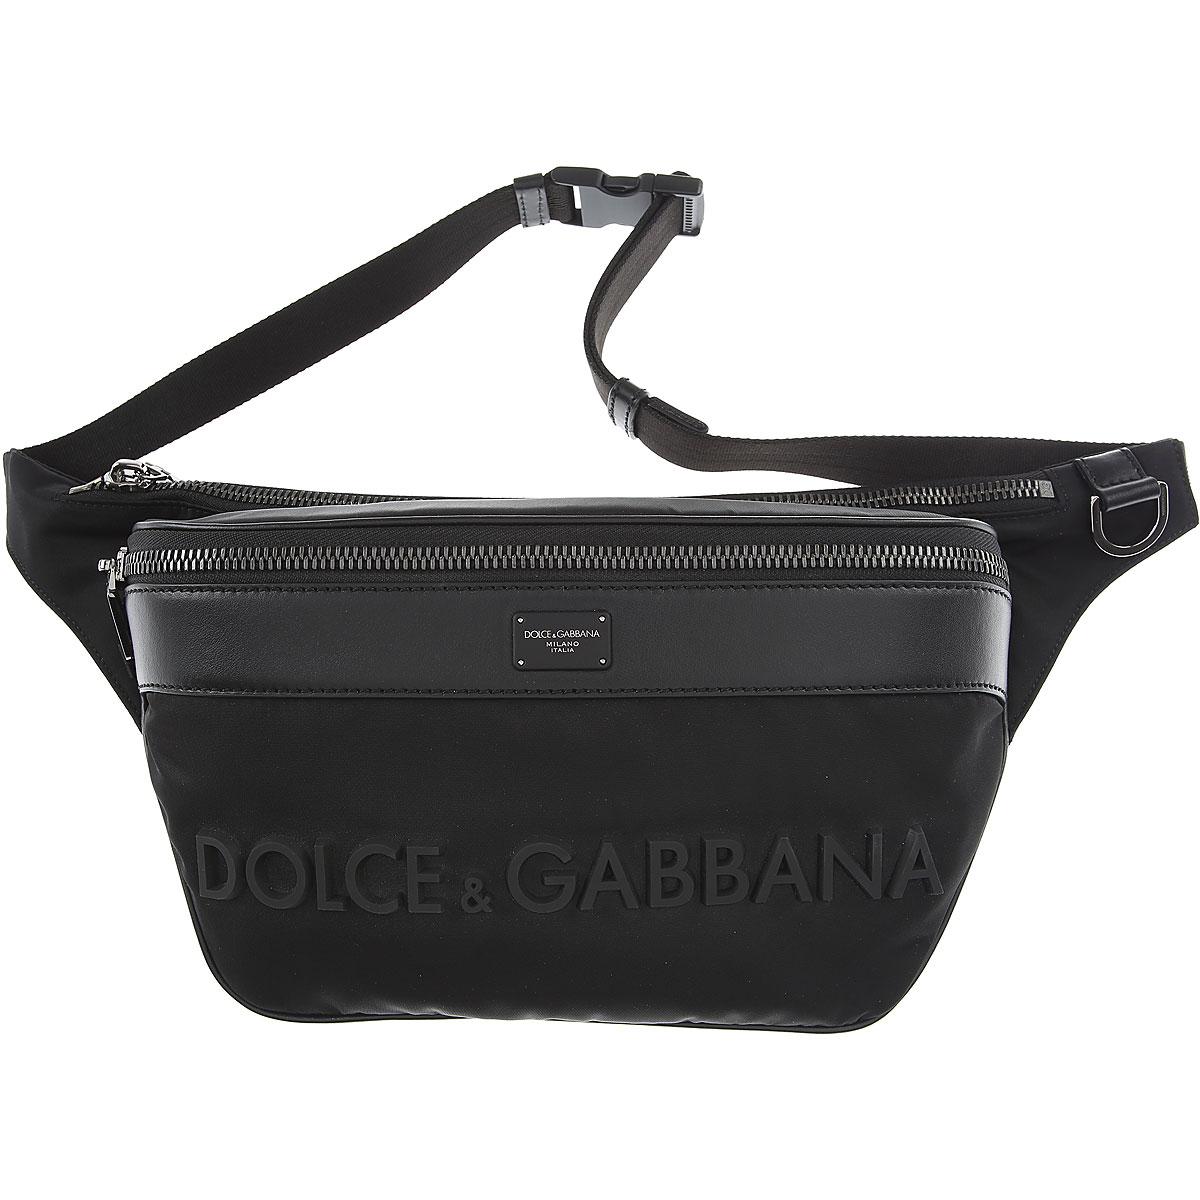 Dolce & Gabbana Shoulder Bags, Black, Nylon, 2017